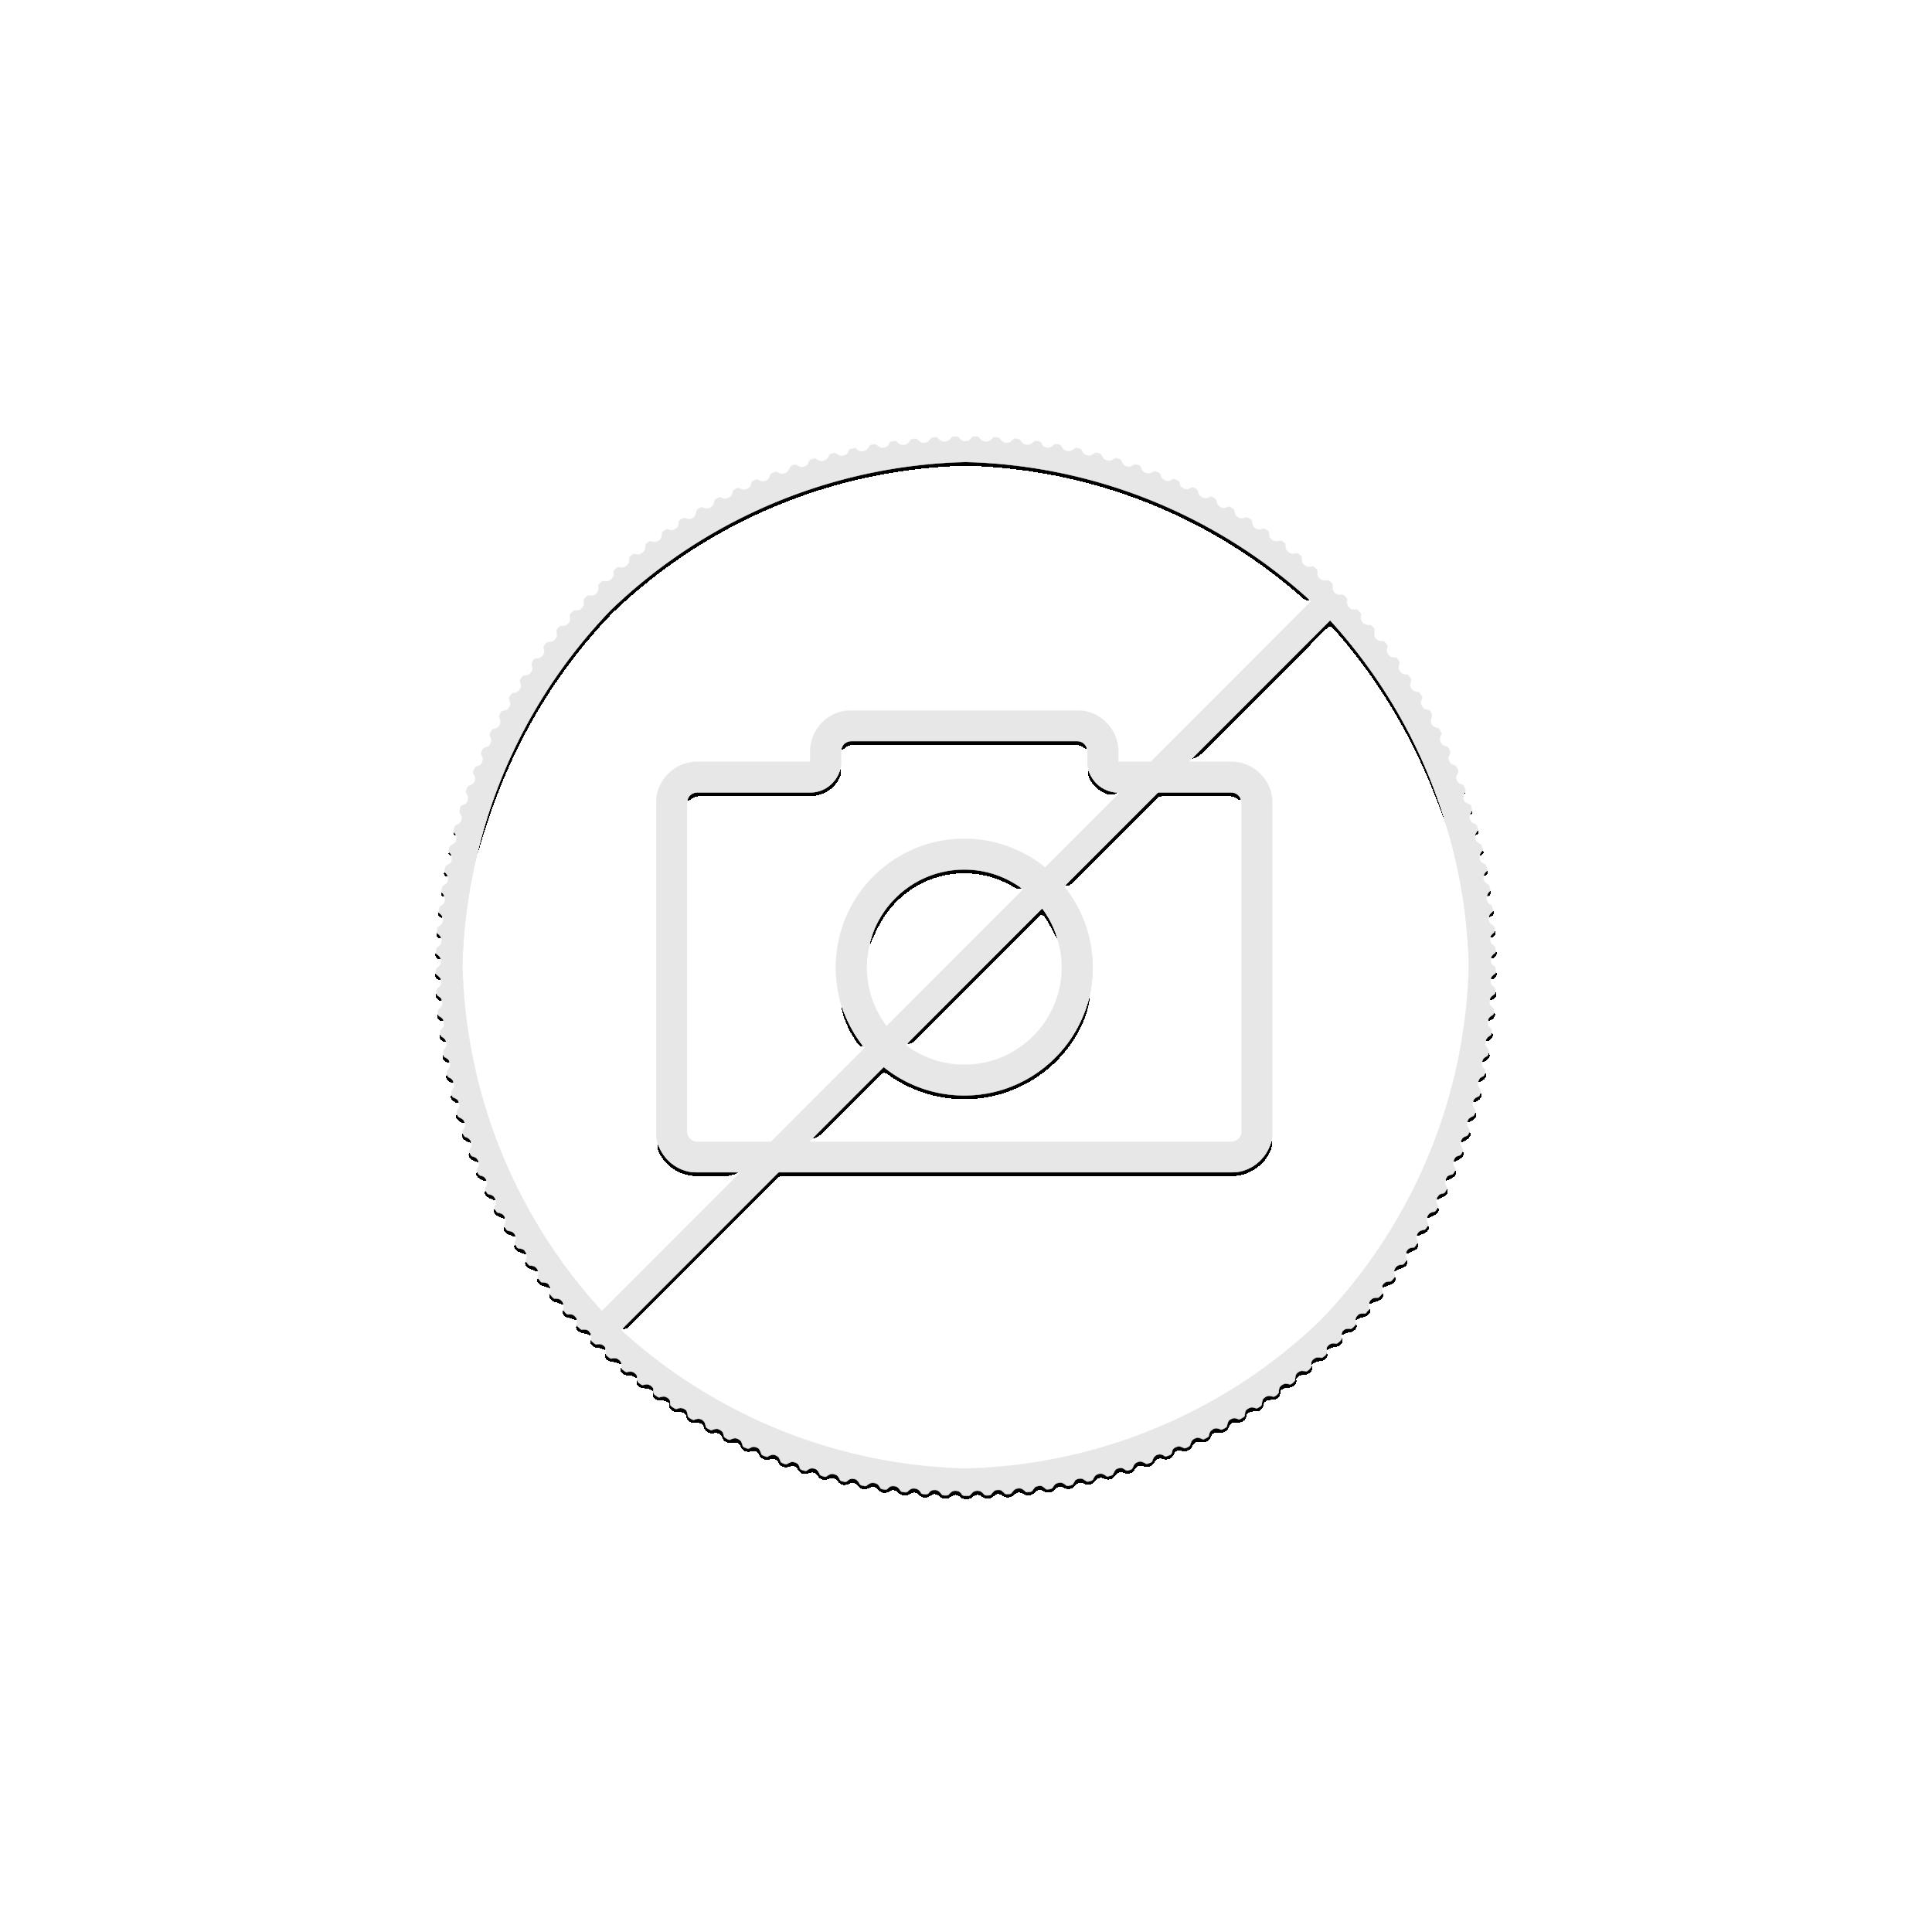 1 Troy ounce zilveren munt Mexican Libertad 2019